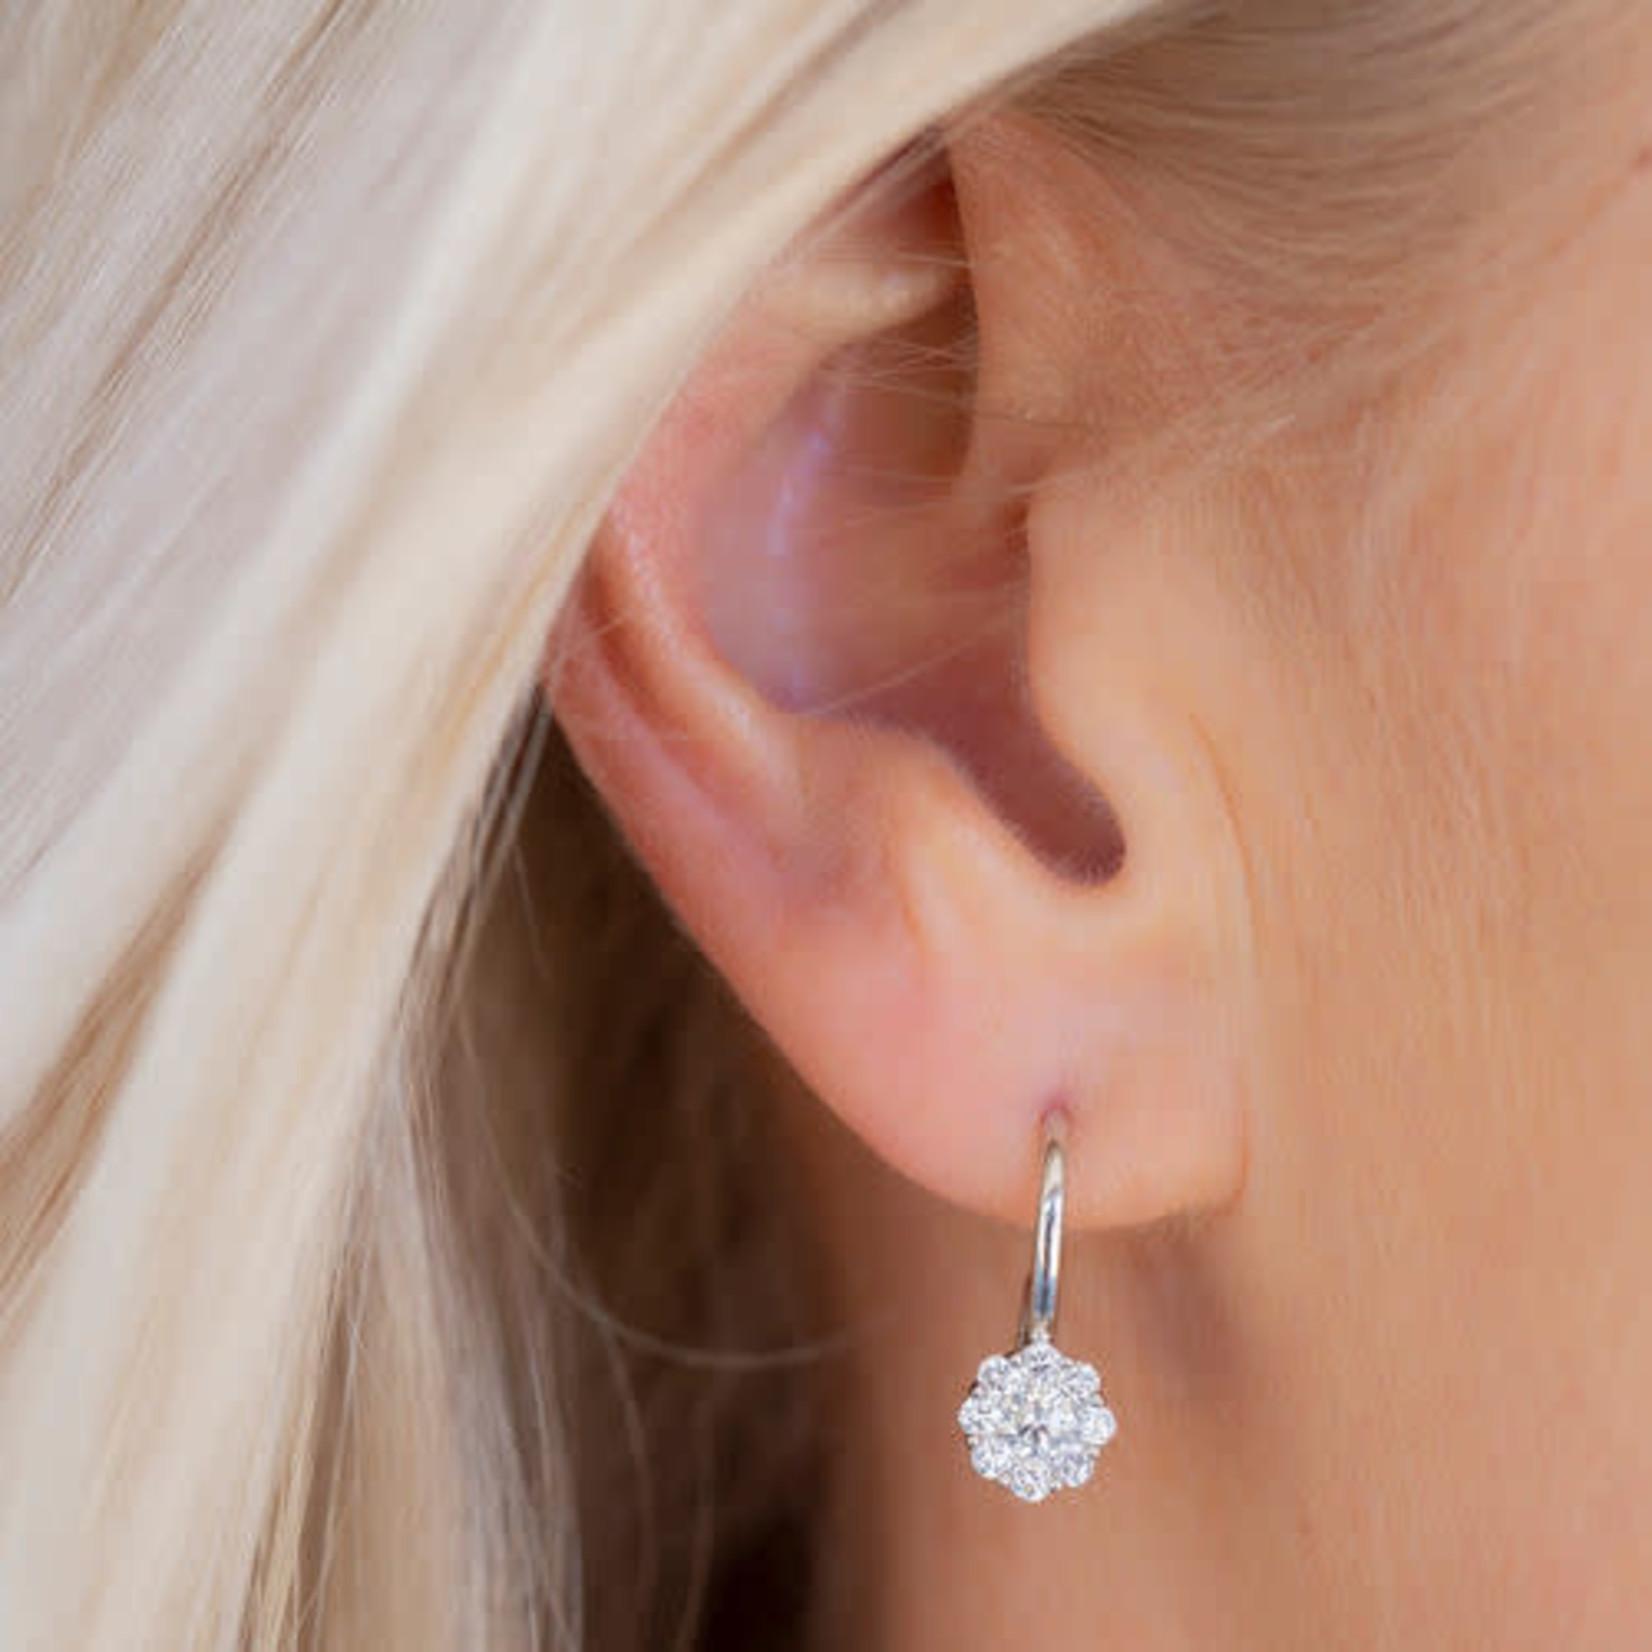 14K White Gold Diamond Cluster Stud Drop Earrings 0.75ctw